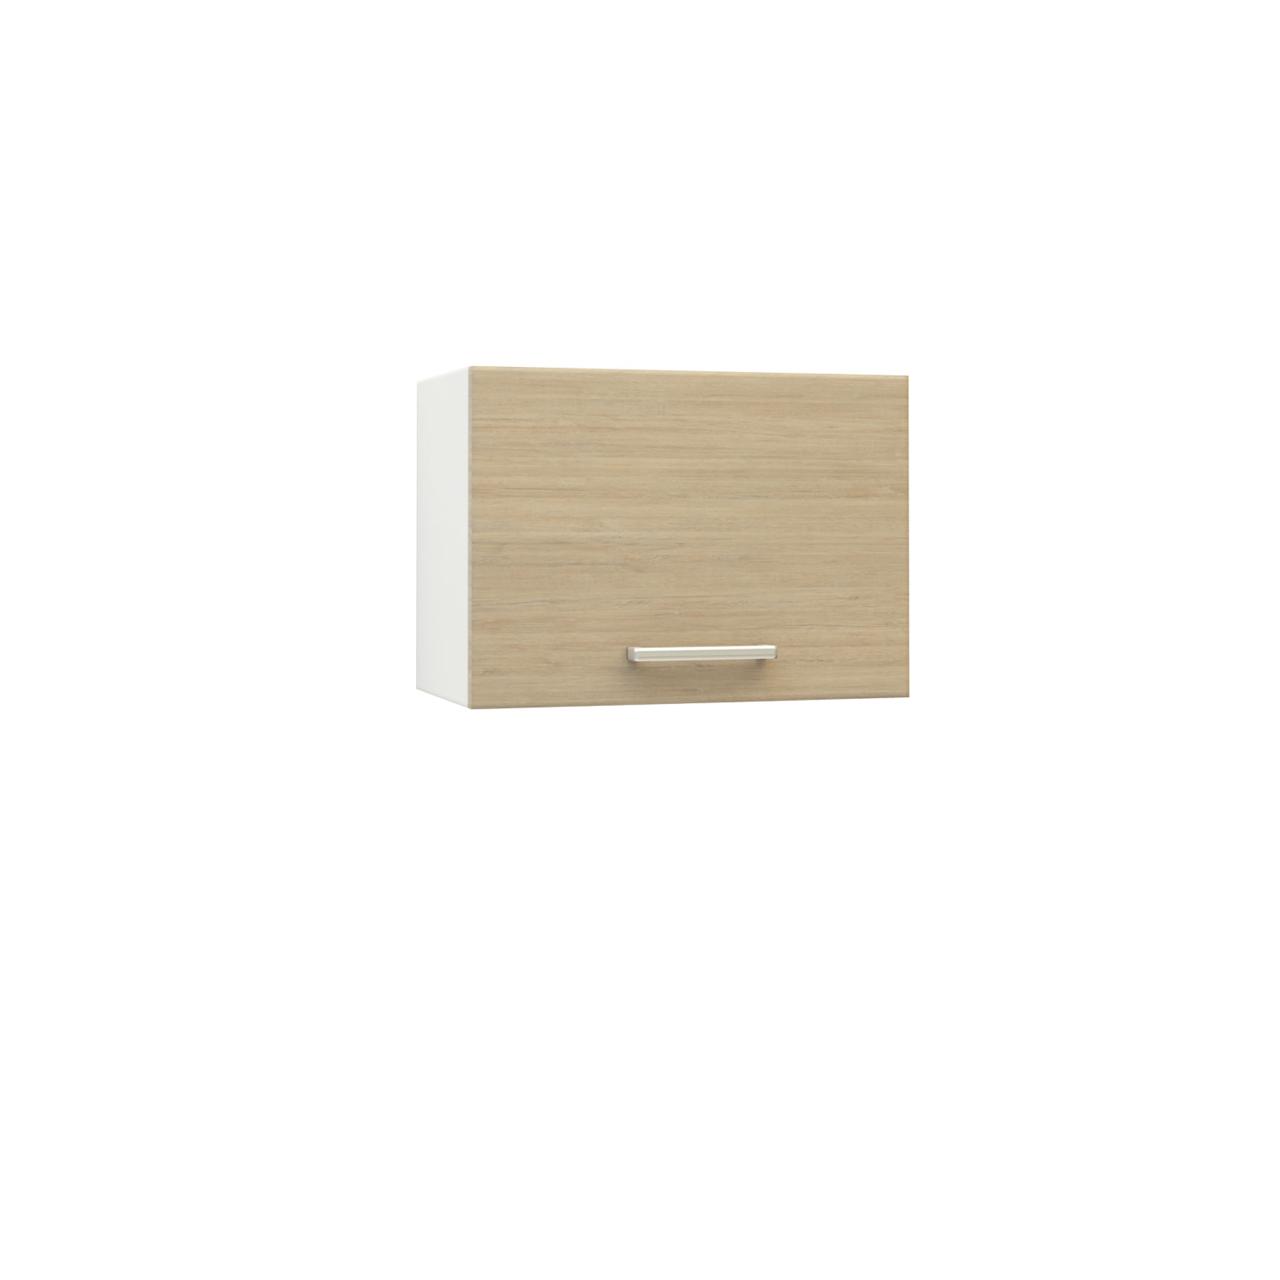 MEBLINE Skříňka horní W50 OKGR - Moreno picard